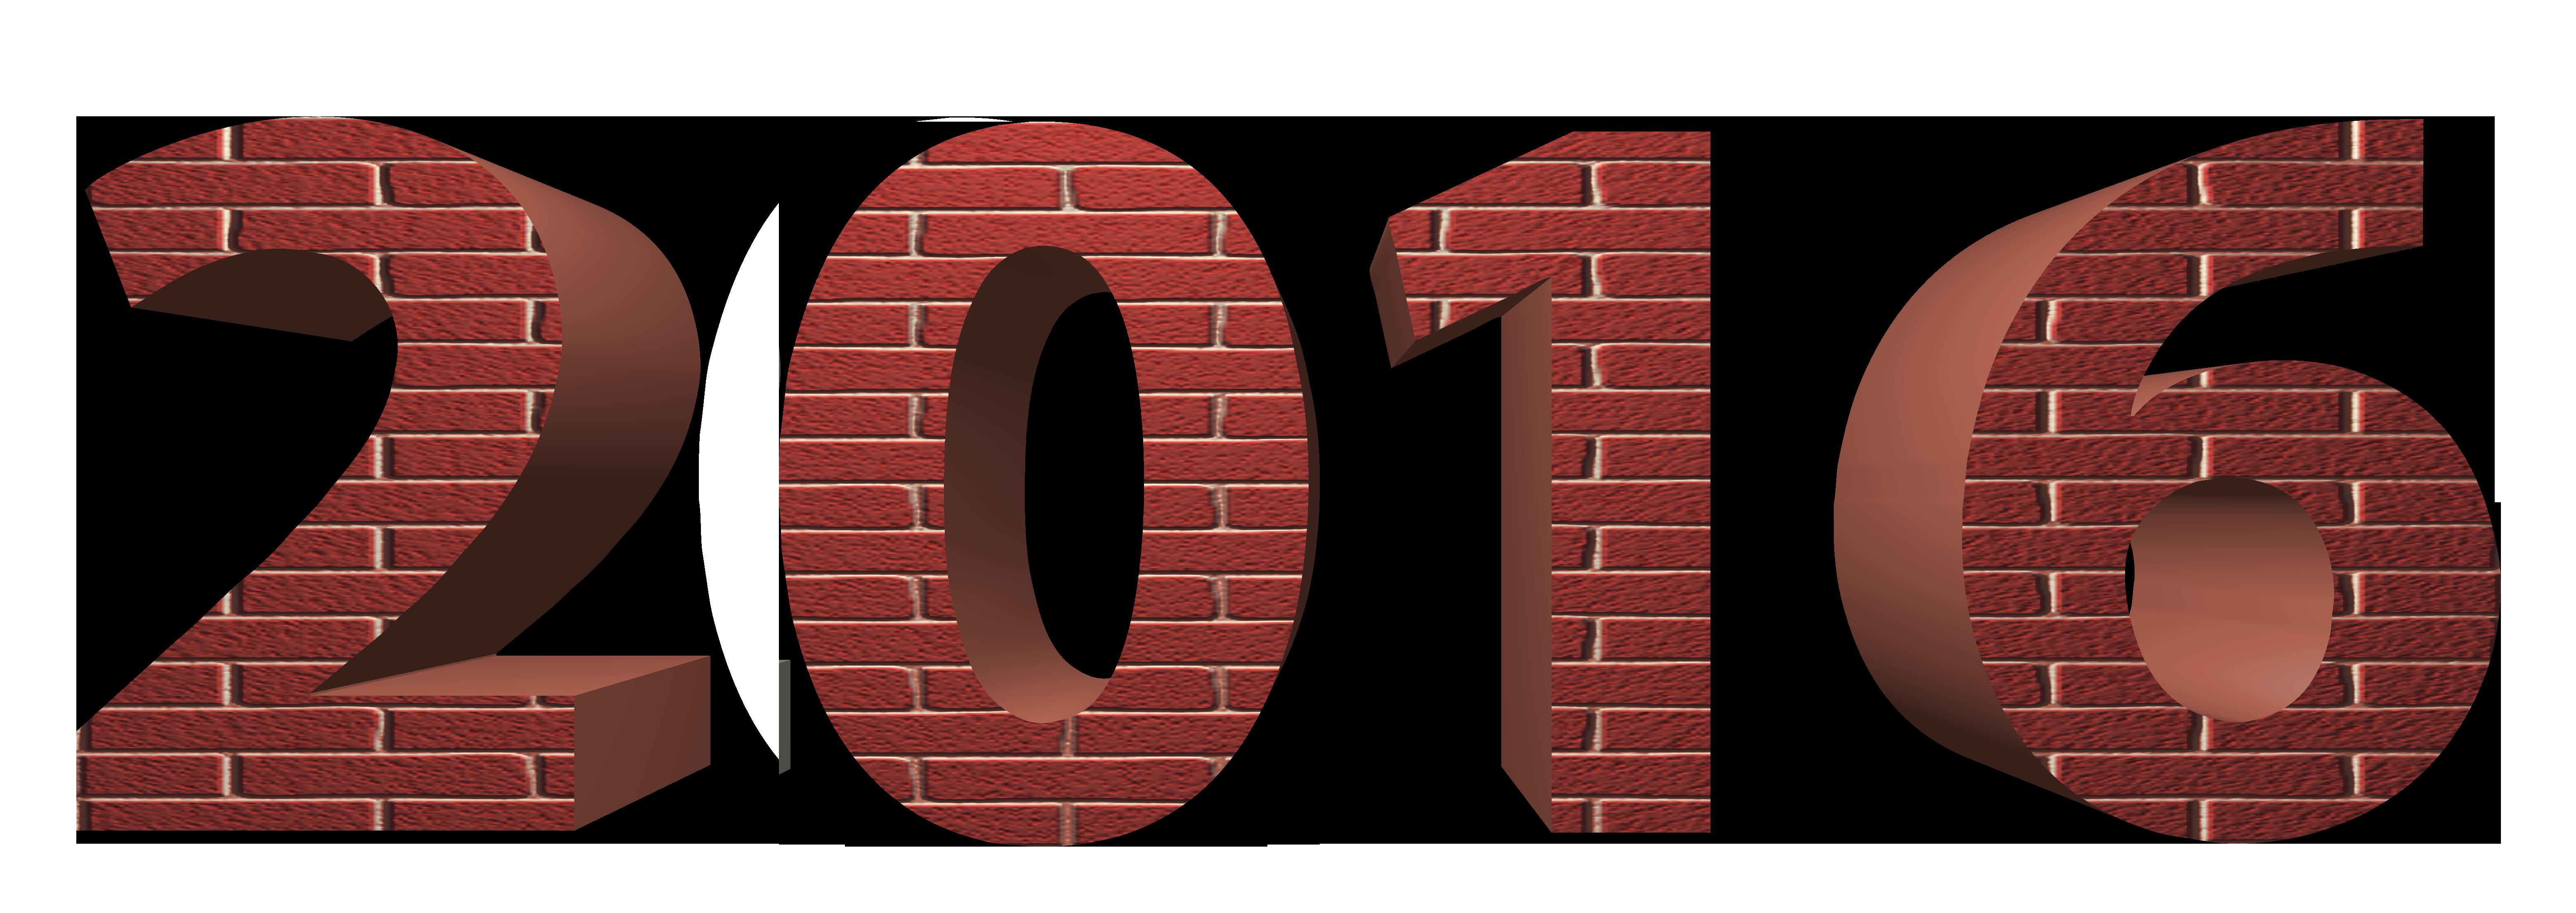 2016 3D Brick PNG Clipart Image.